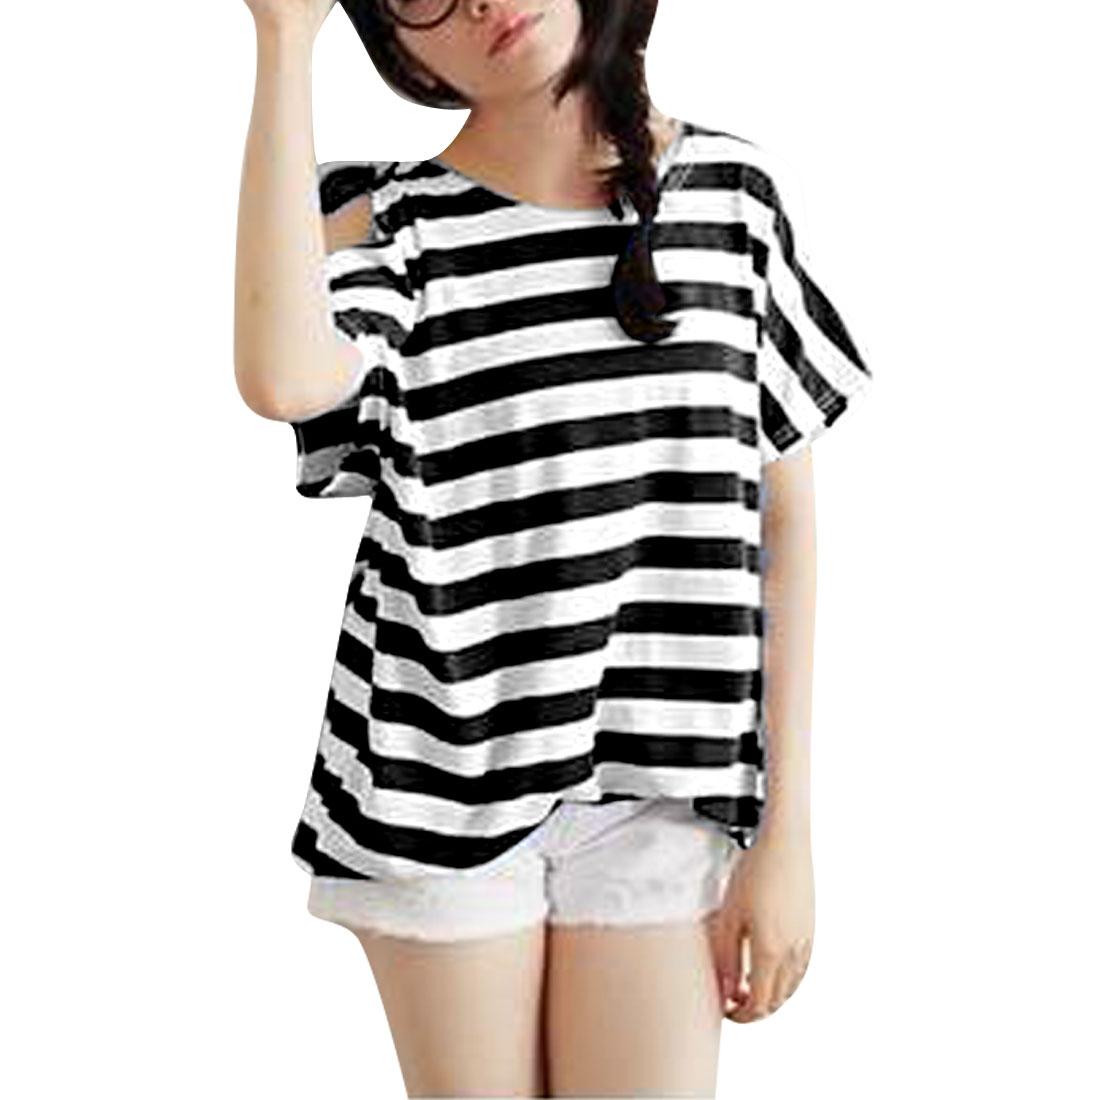 Ladies Short Dolman Sleeve Stripes Pattern Cutout Shoulder Black White Shirt M